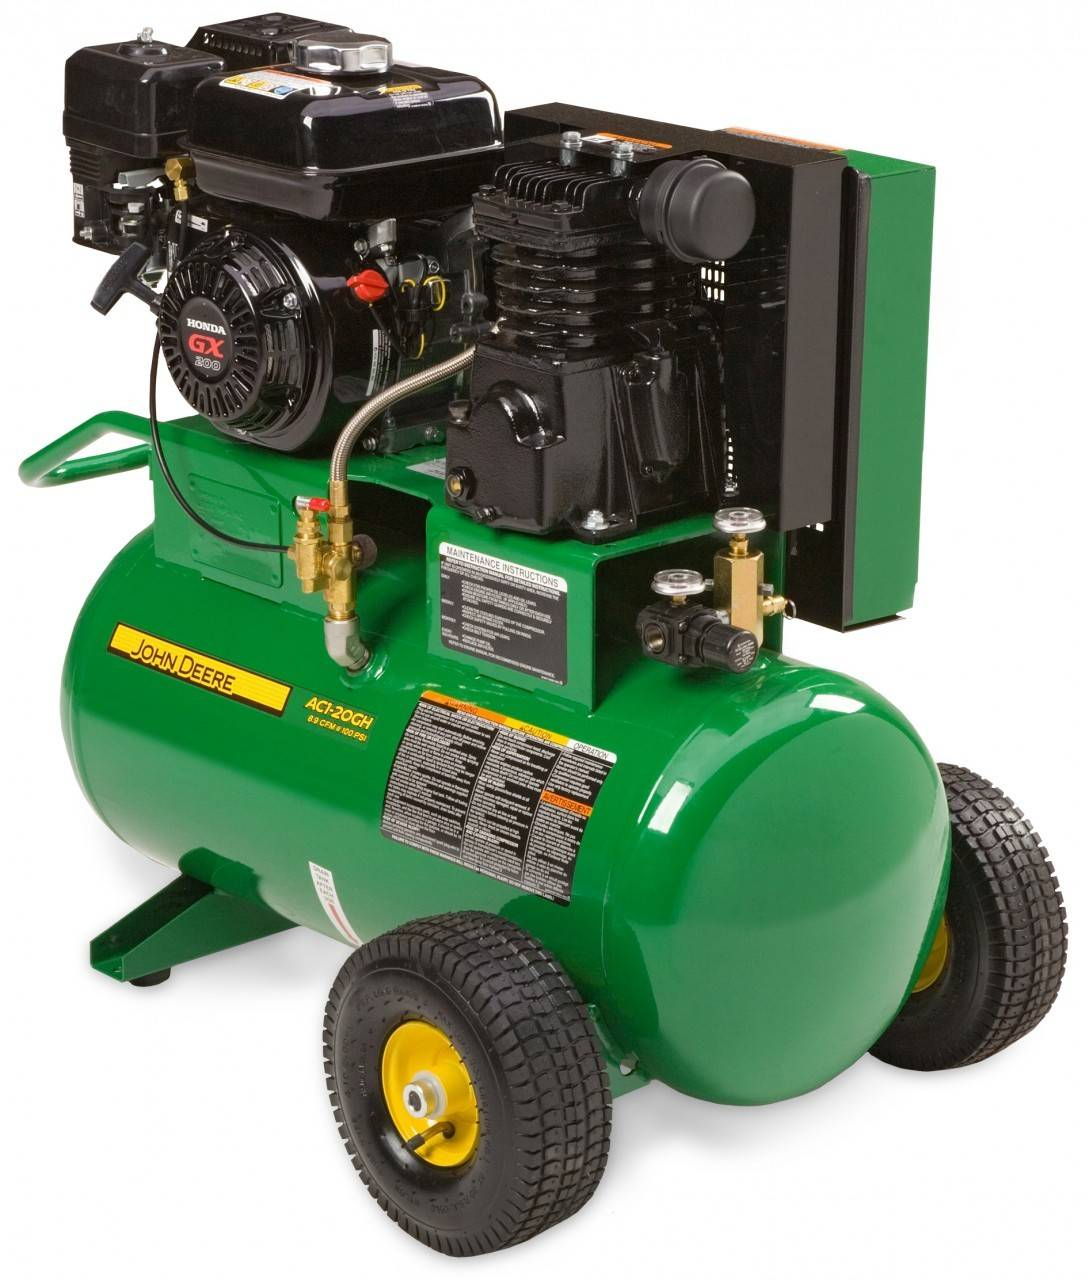 John Deere Air Compressor >> John Deere Ac1 20gh 20gal Portable Gasoline Air Compressor John